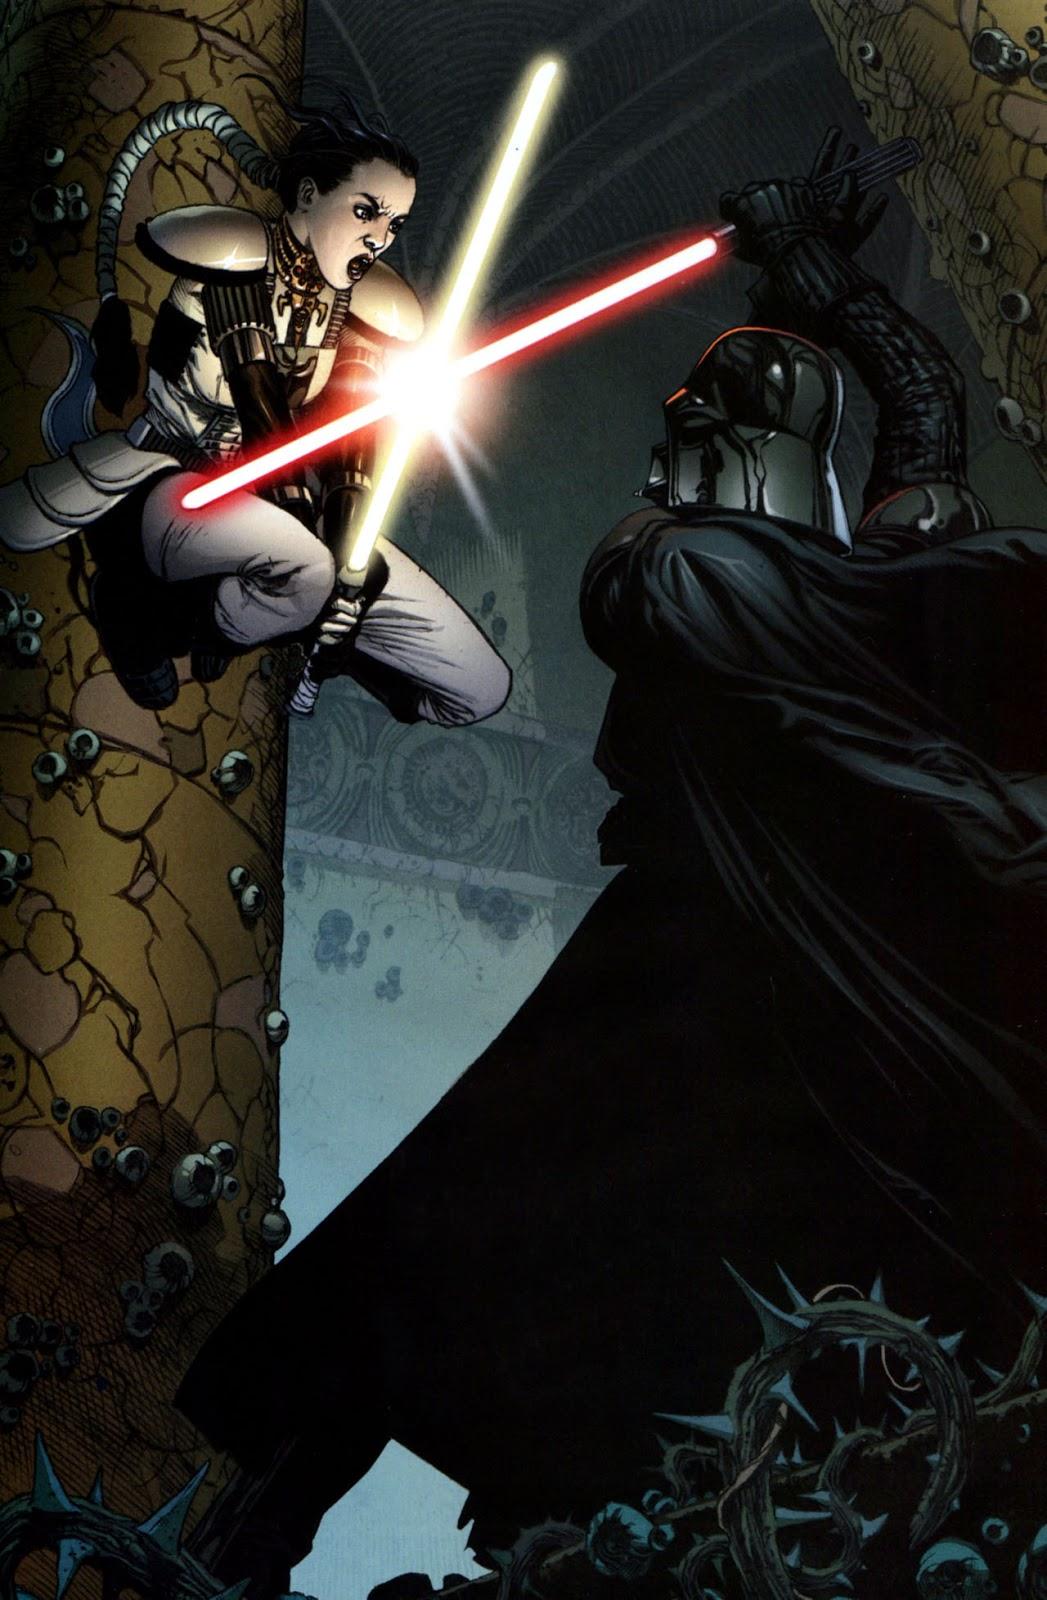 Darth Vader vs A'Sharad Hett - Page 3 7A3Kpu9sUXSa-Wq-RvfmE5qr5MRNOZs5RqD9gRxn0mxCRLTnwTEzWvsvYsCPl40fN9xA2WqTdH8a96kVpxtaRAH-hS5mS60Lh3jqyNjGQkisD594i1RjsI0V8Ax3S53R96B58AjR